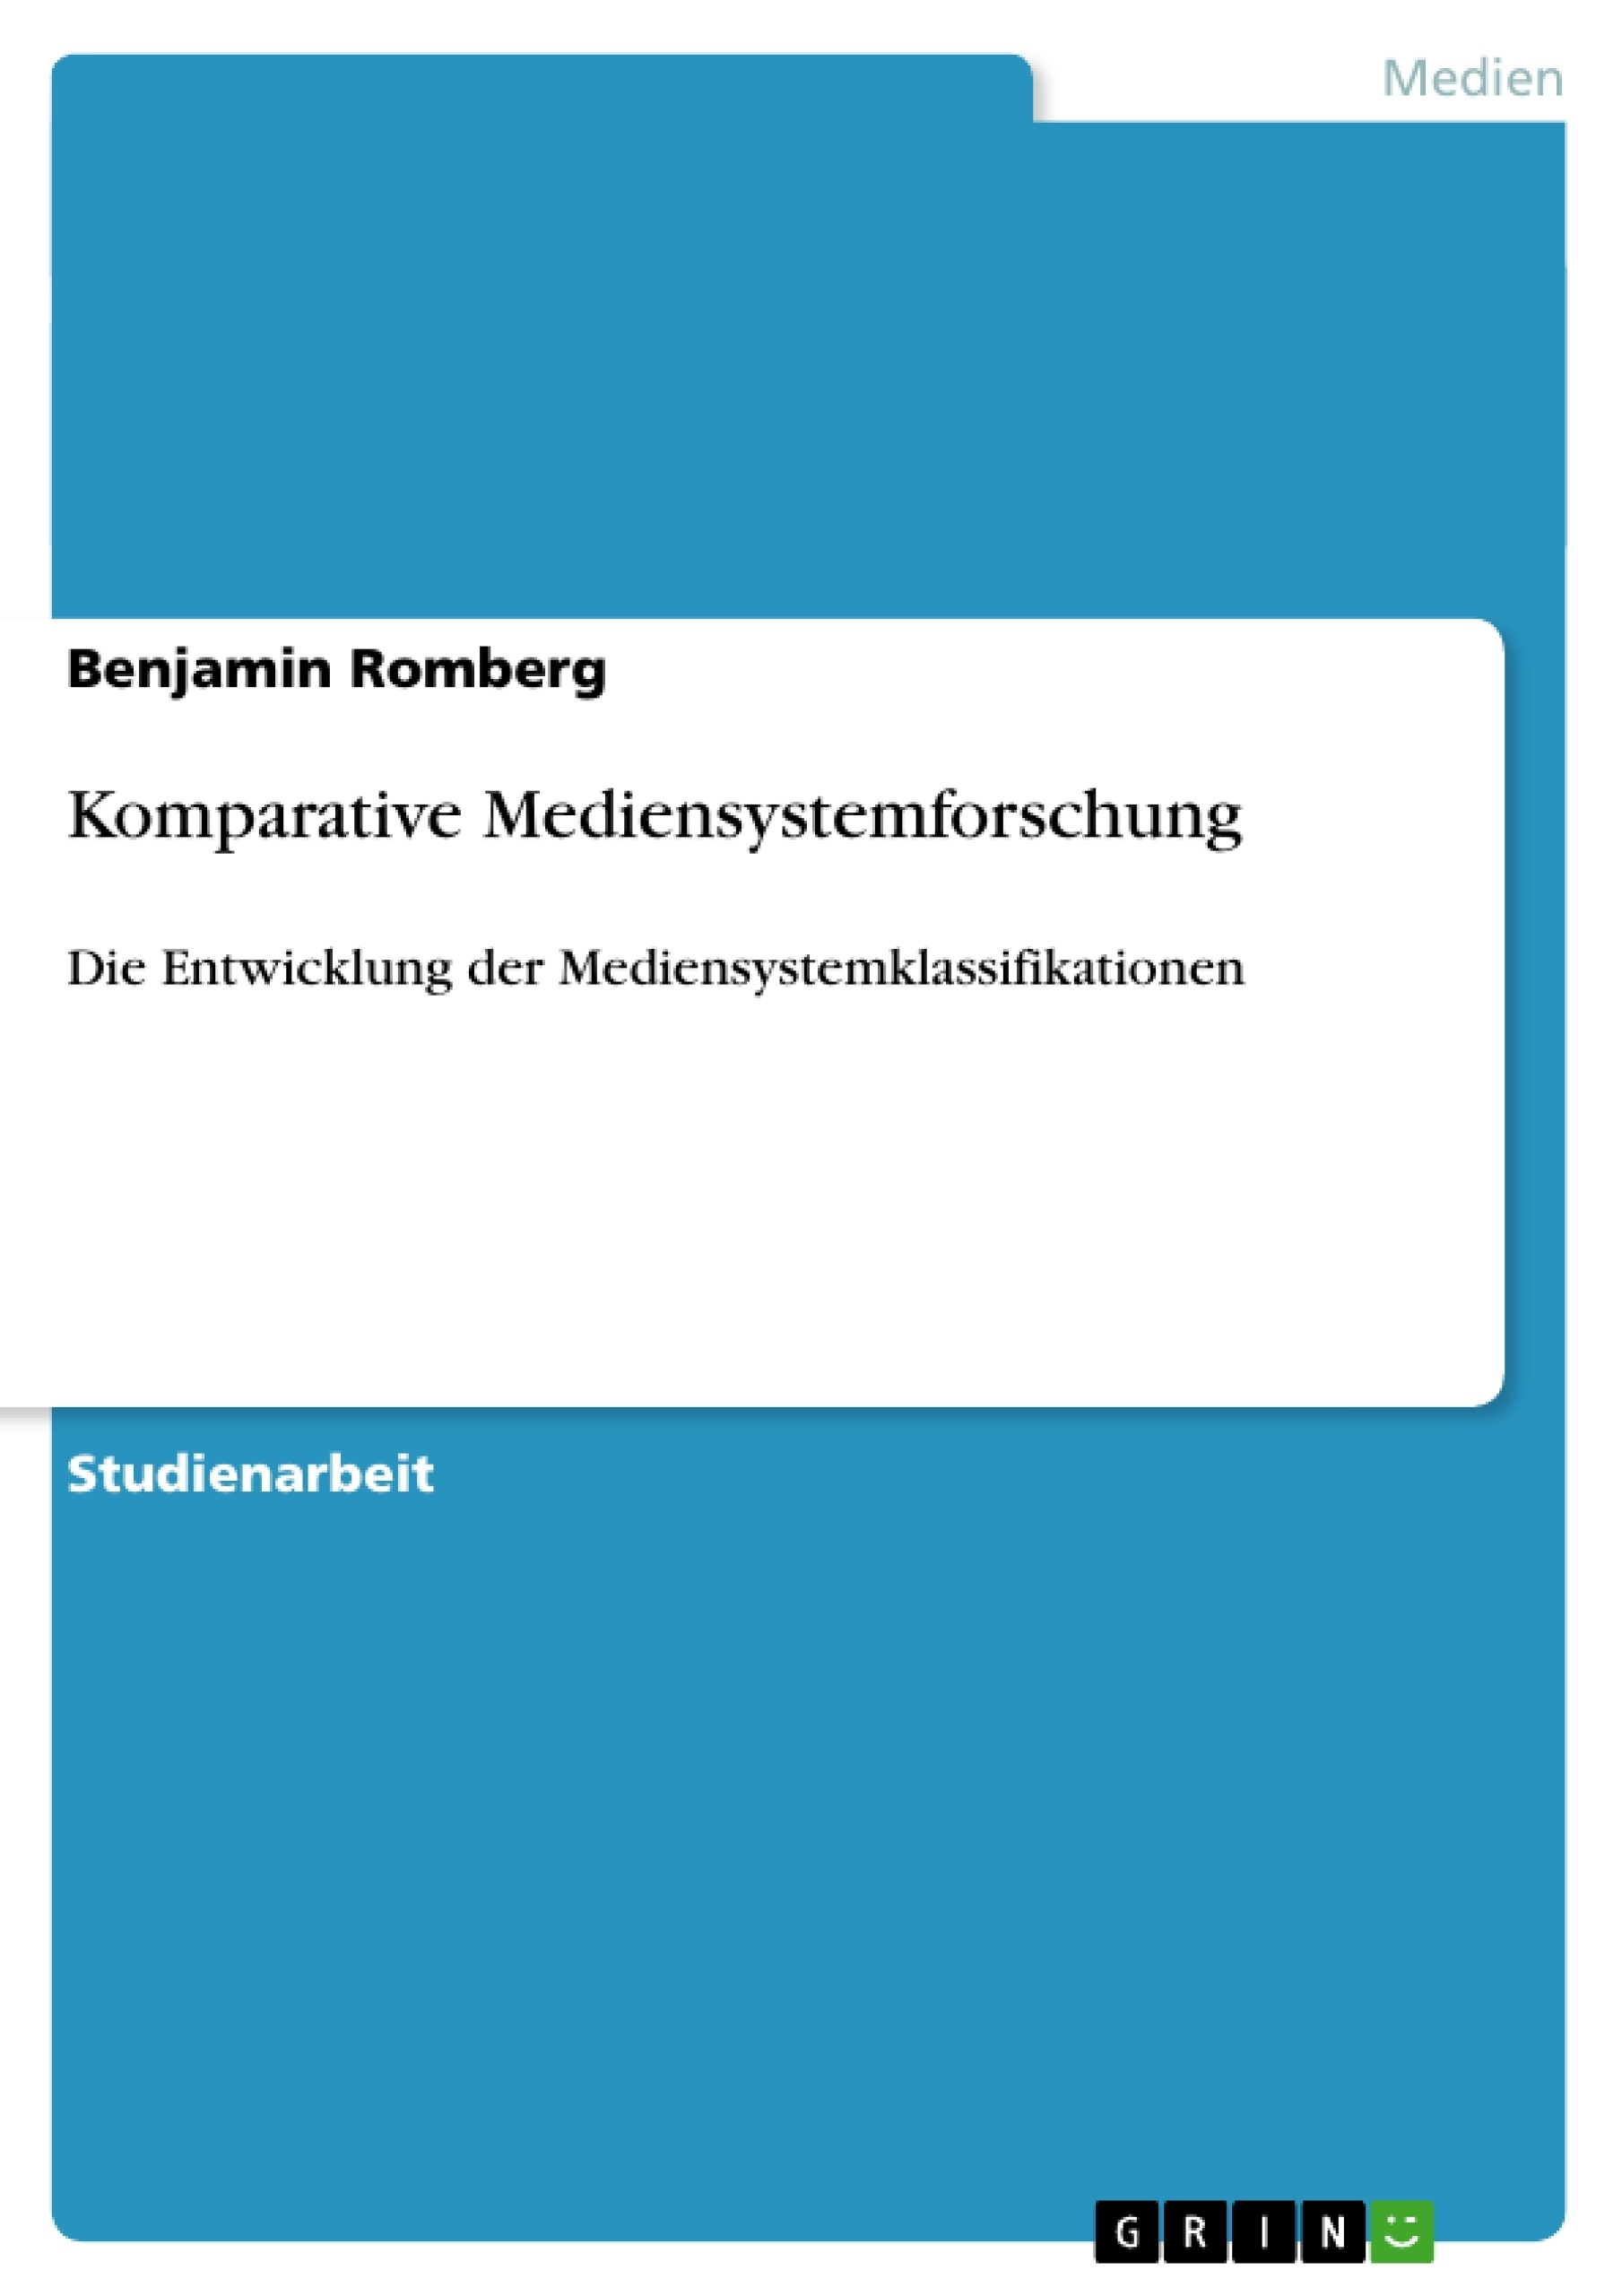 Titel: Komparative Mediensystemforschung